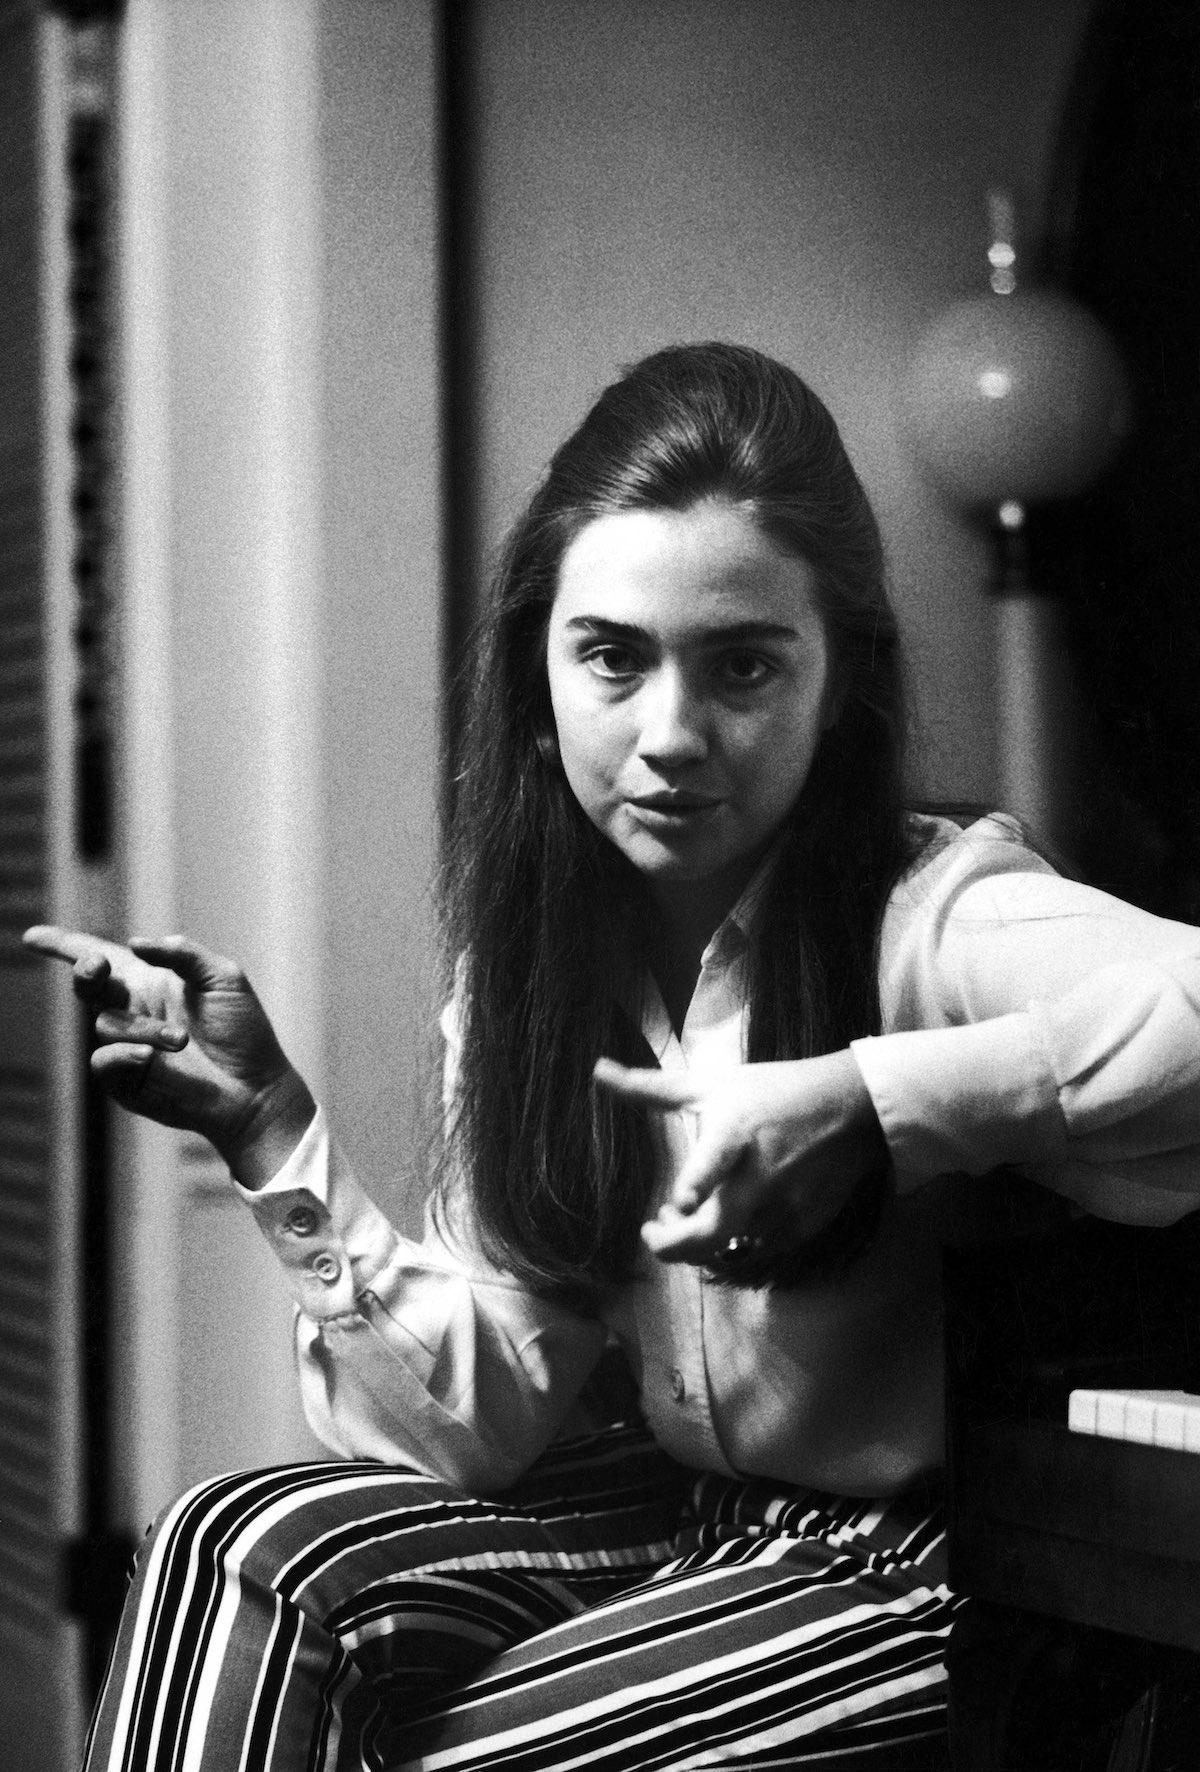 Hilary-3